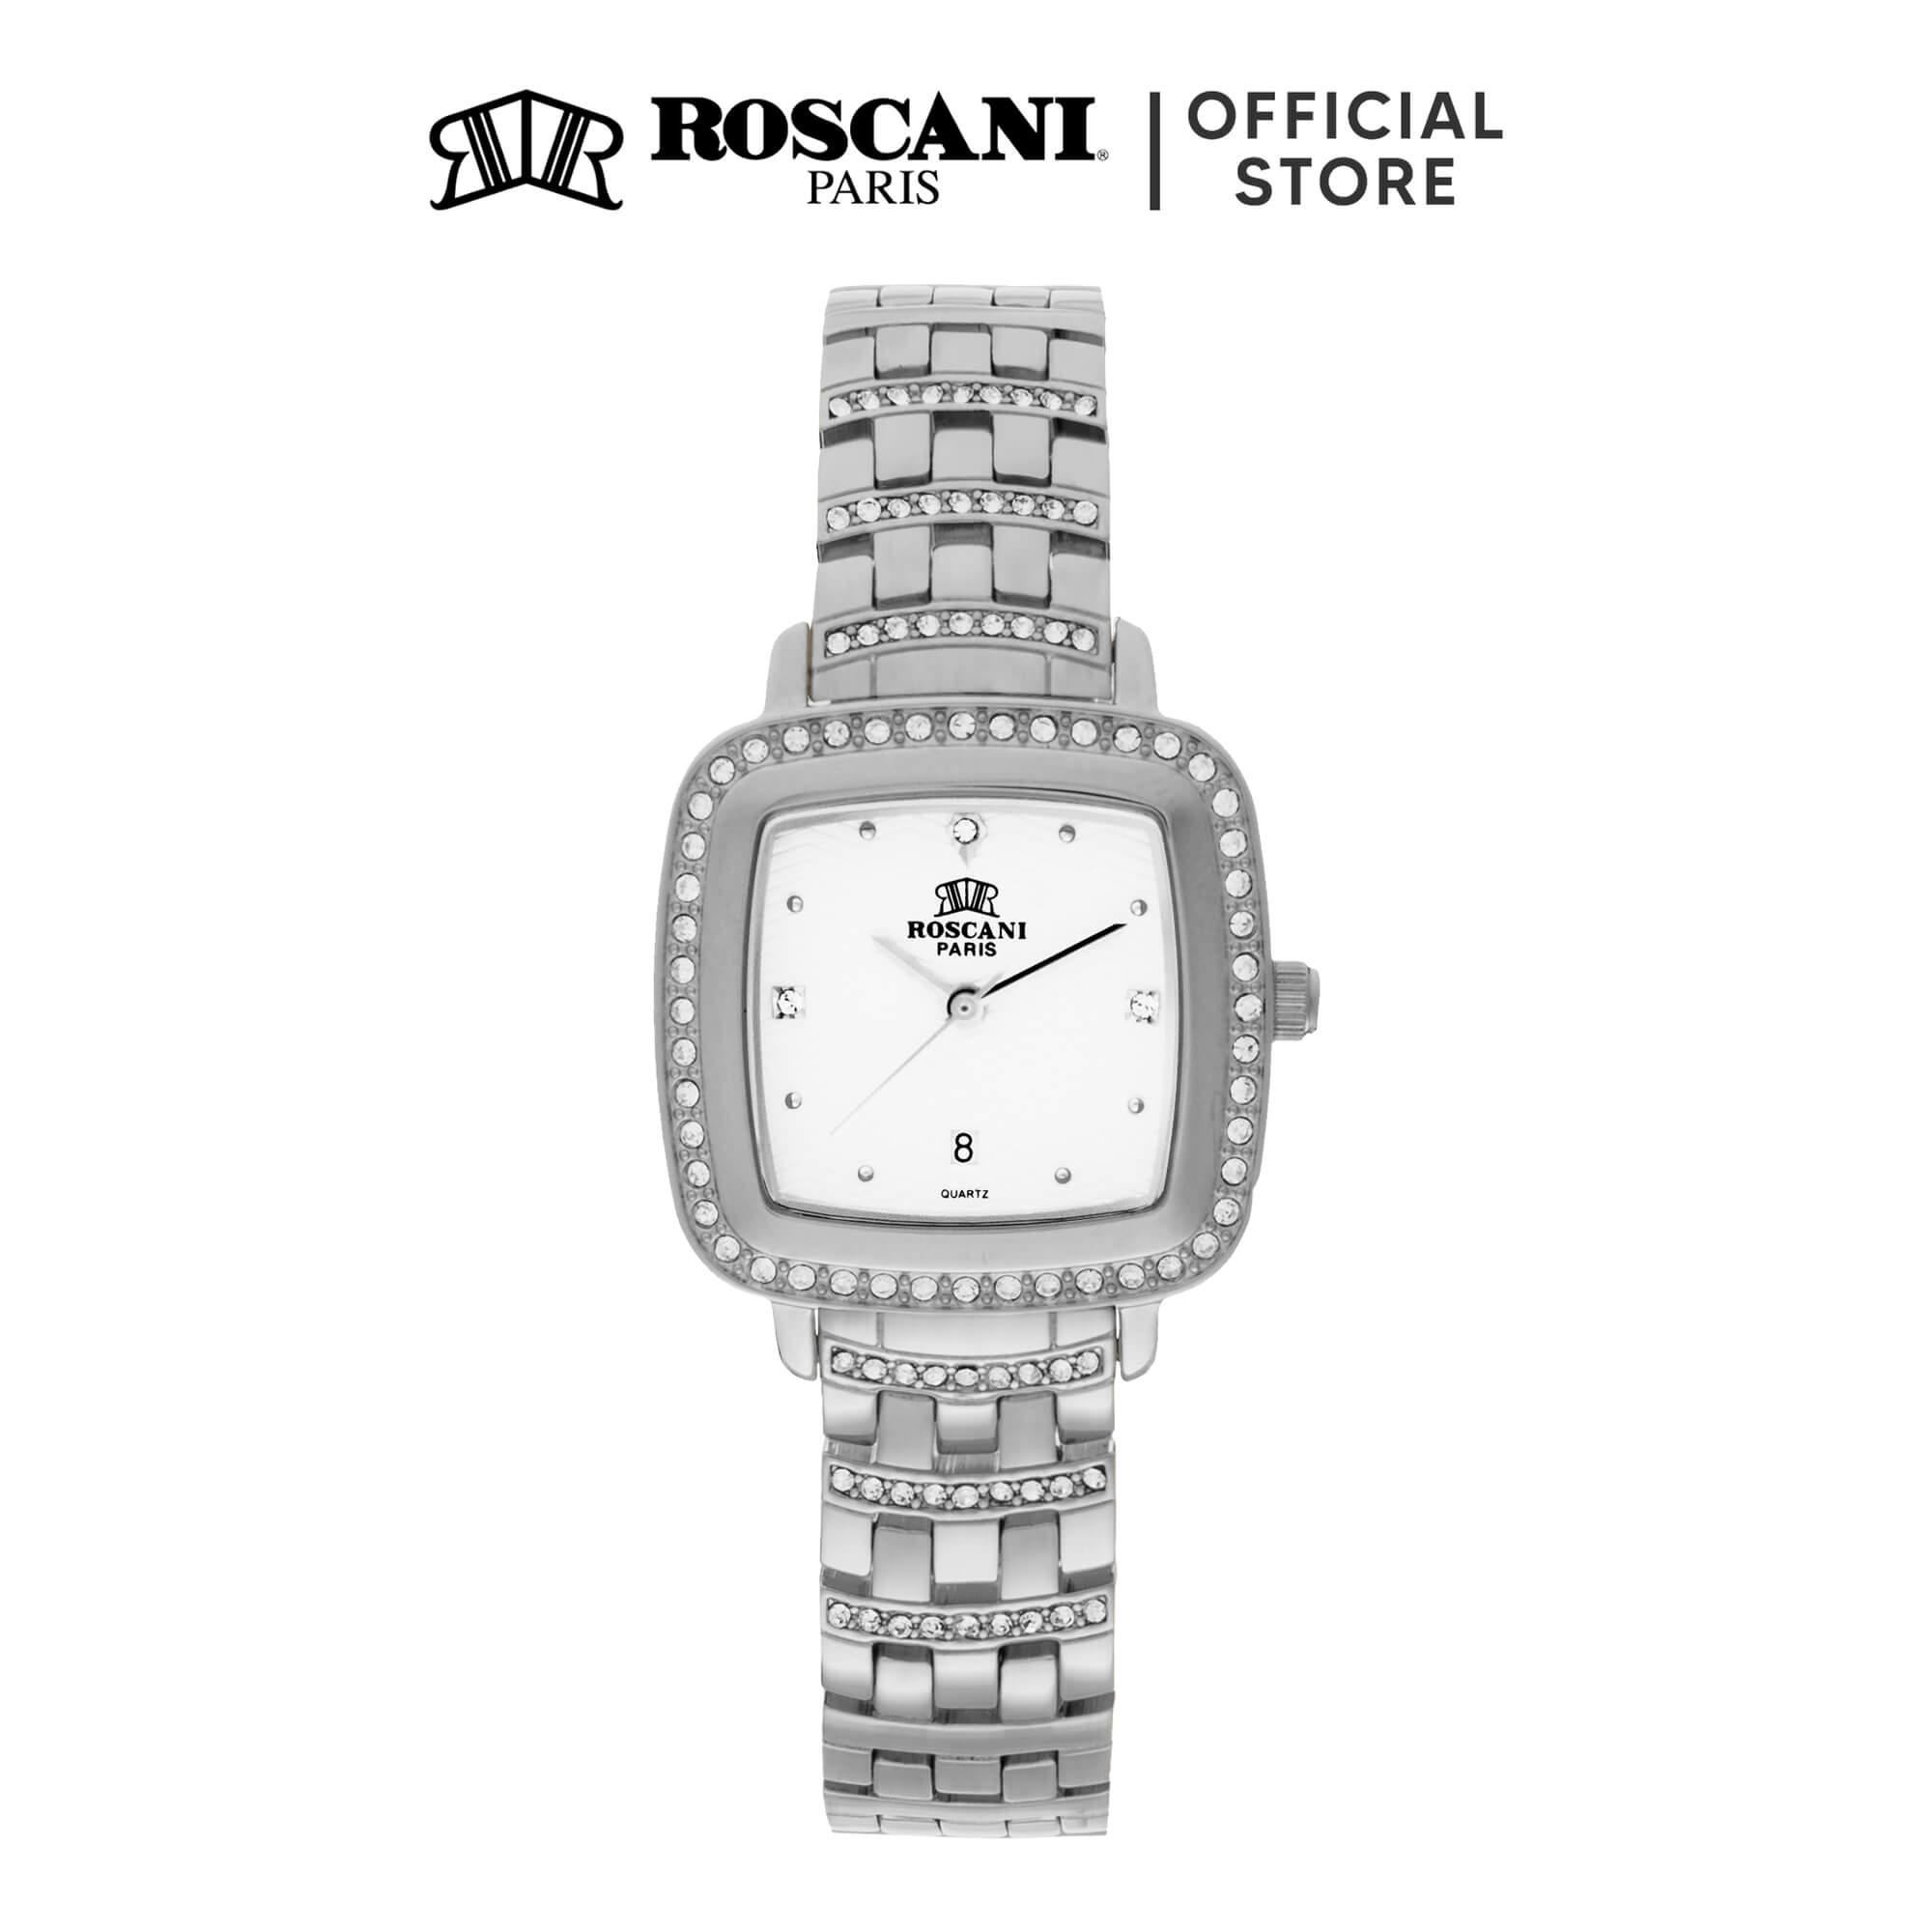 Roscani Laura B62 (Triangle Wave Dial) Bracelet Women Watch